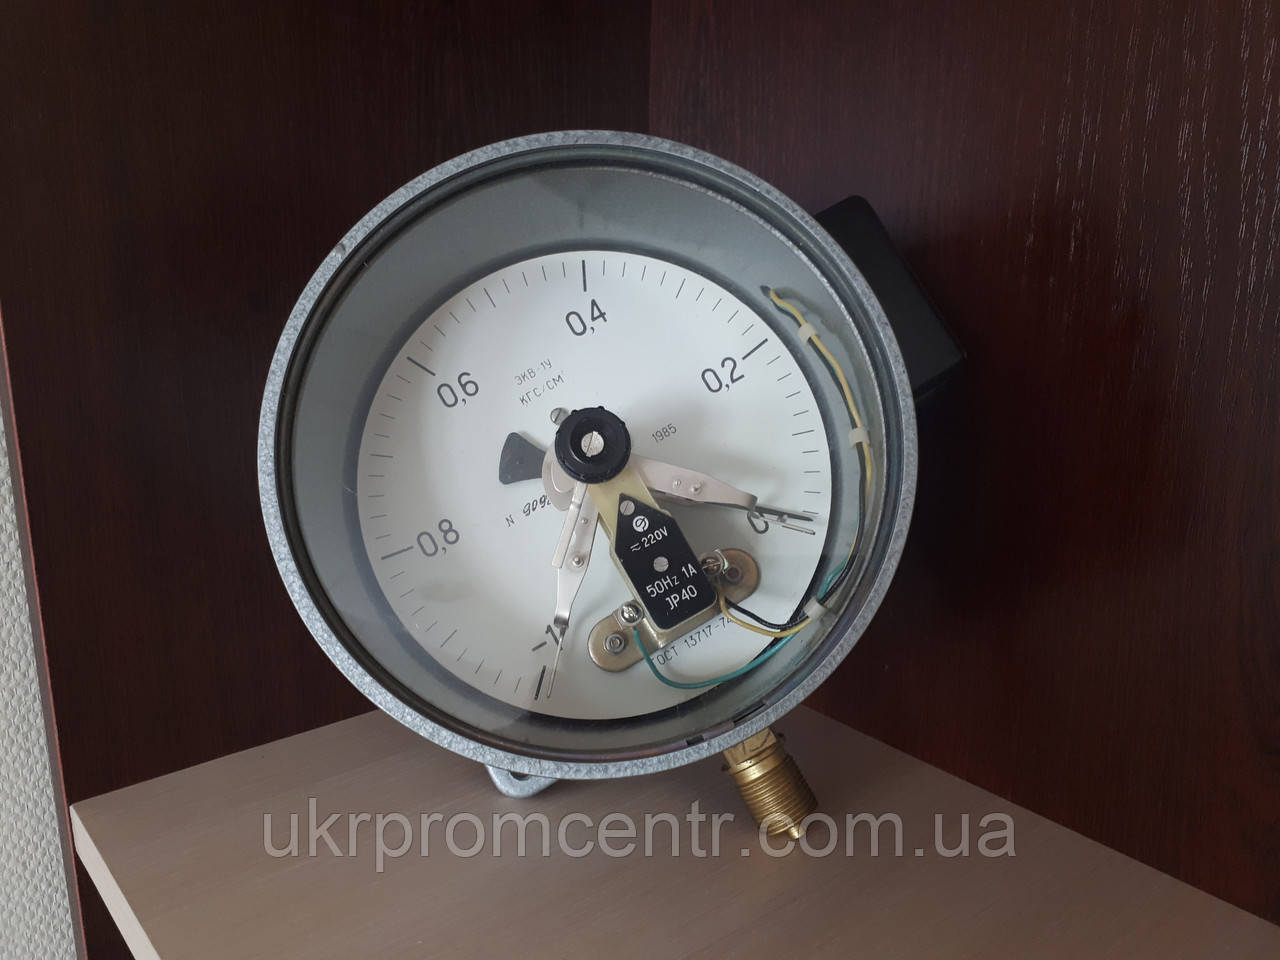 Вакуумметр электроконтактный ЭКВ-1У